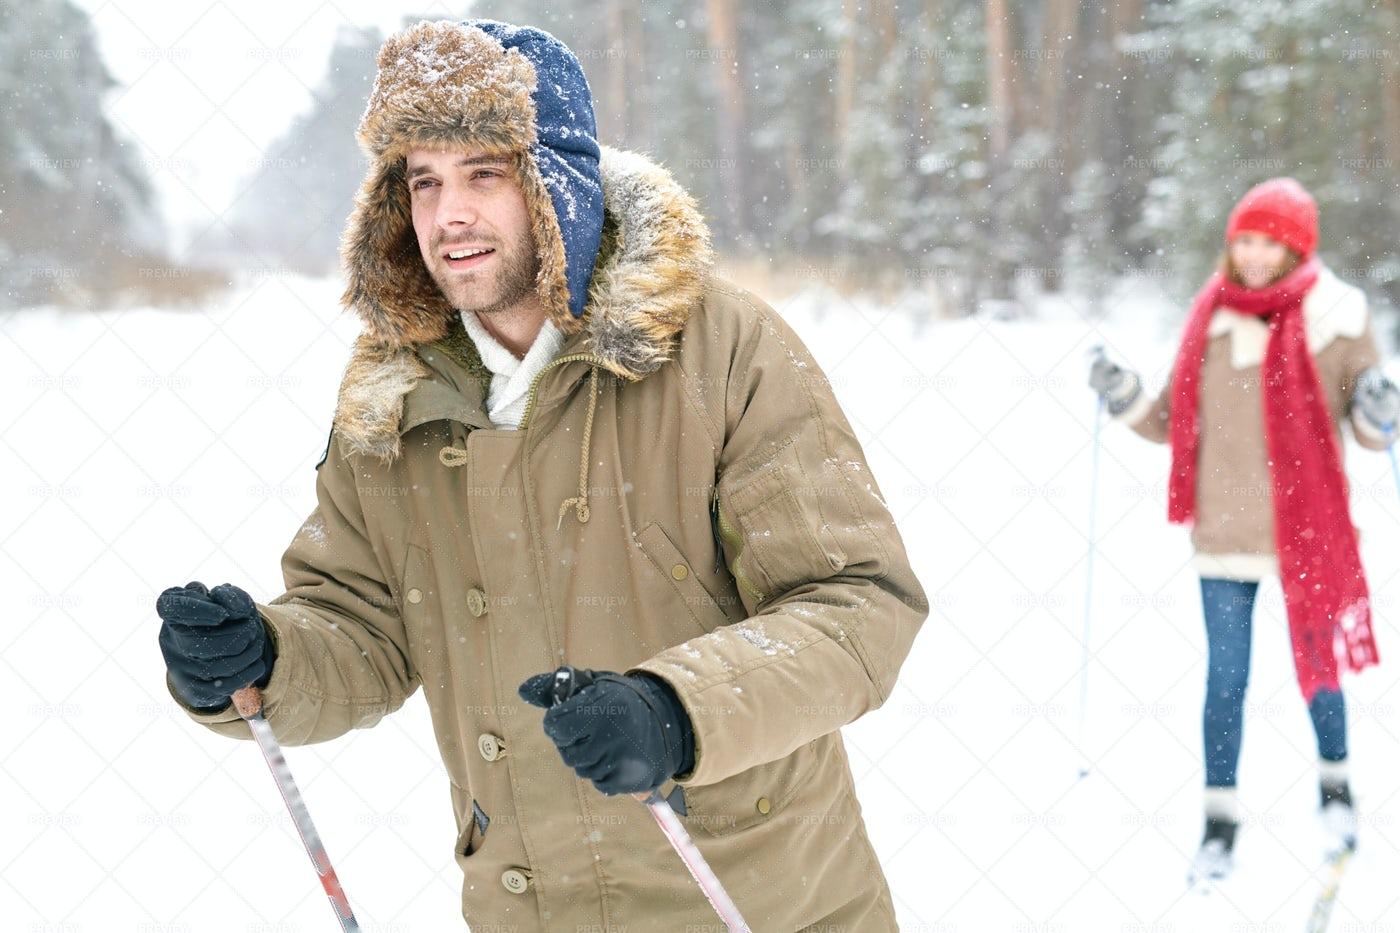 Handsome Man Skiing In Winter...: Stock Photos